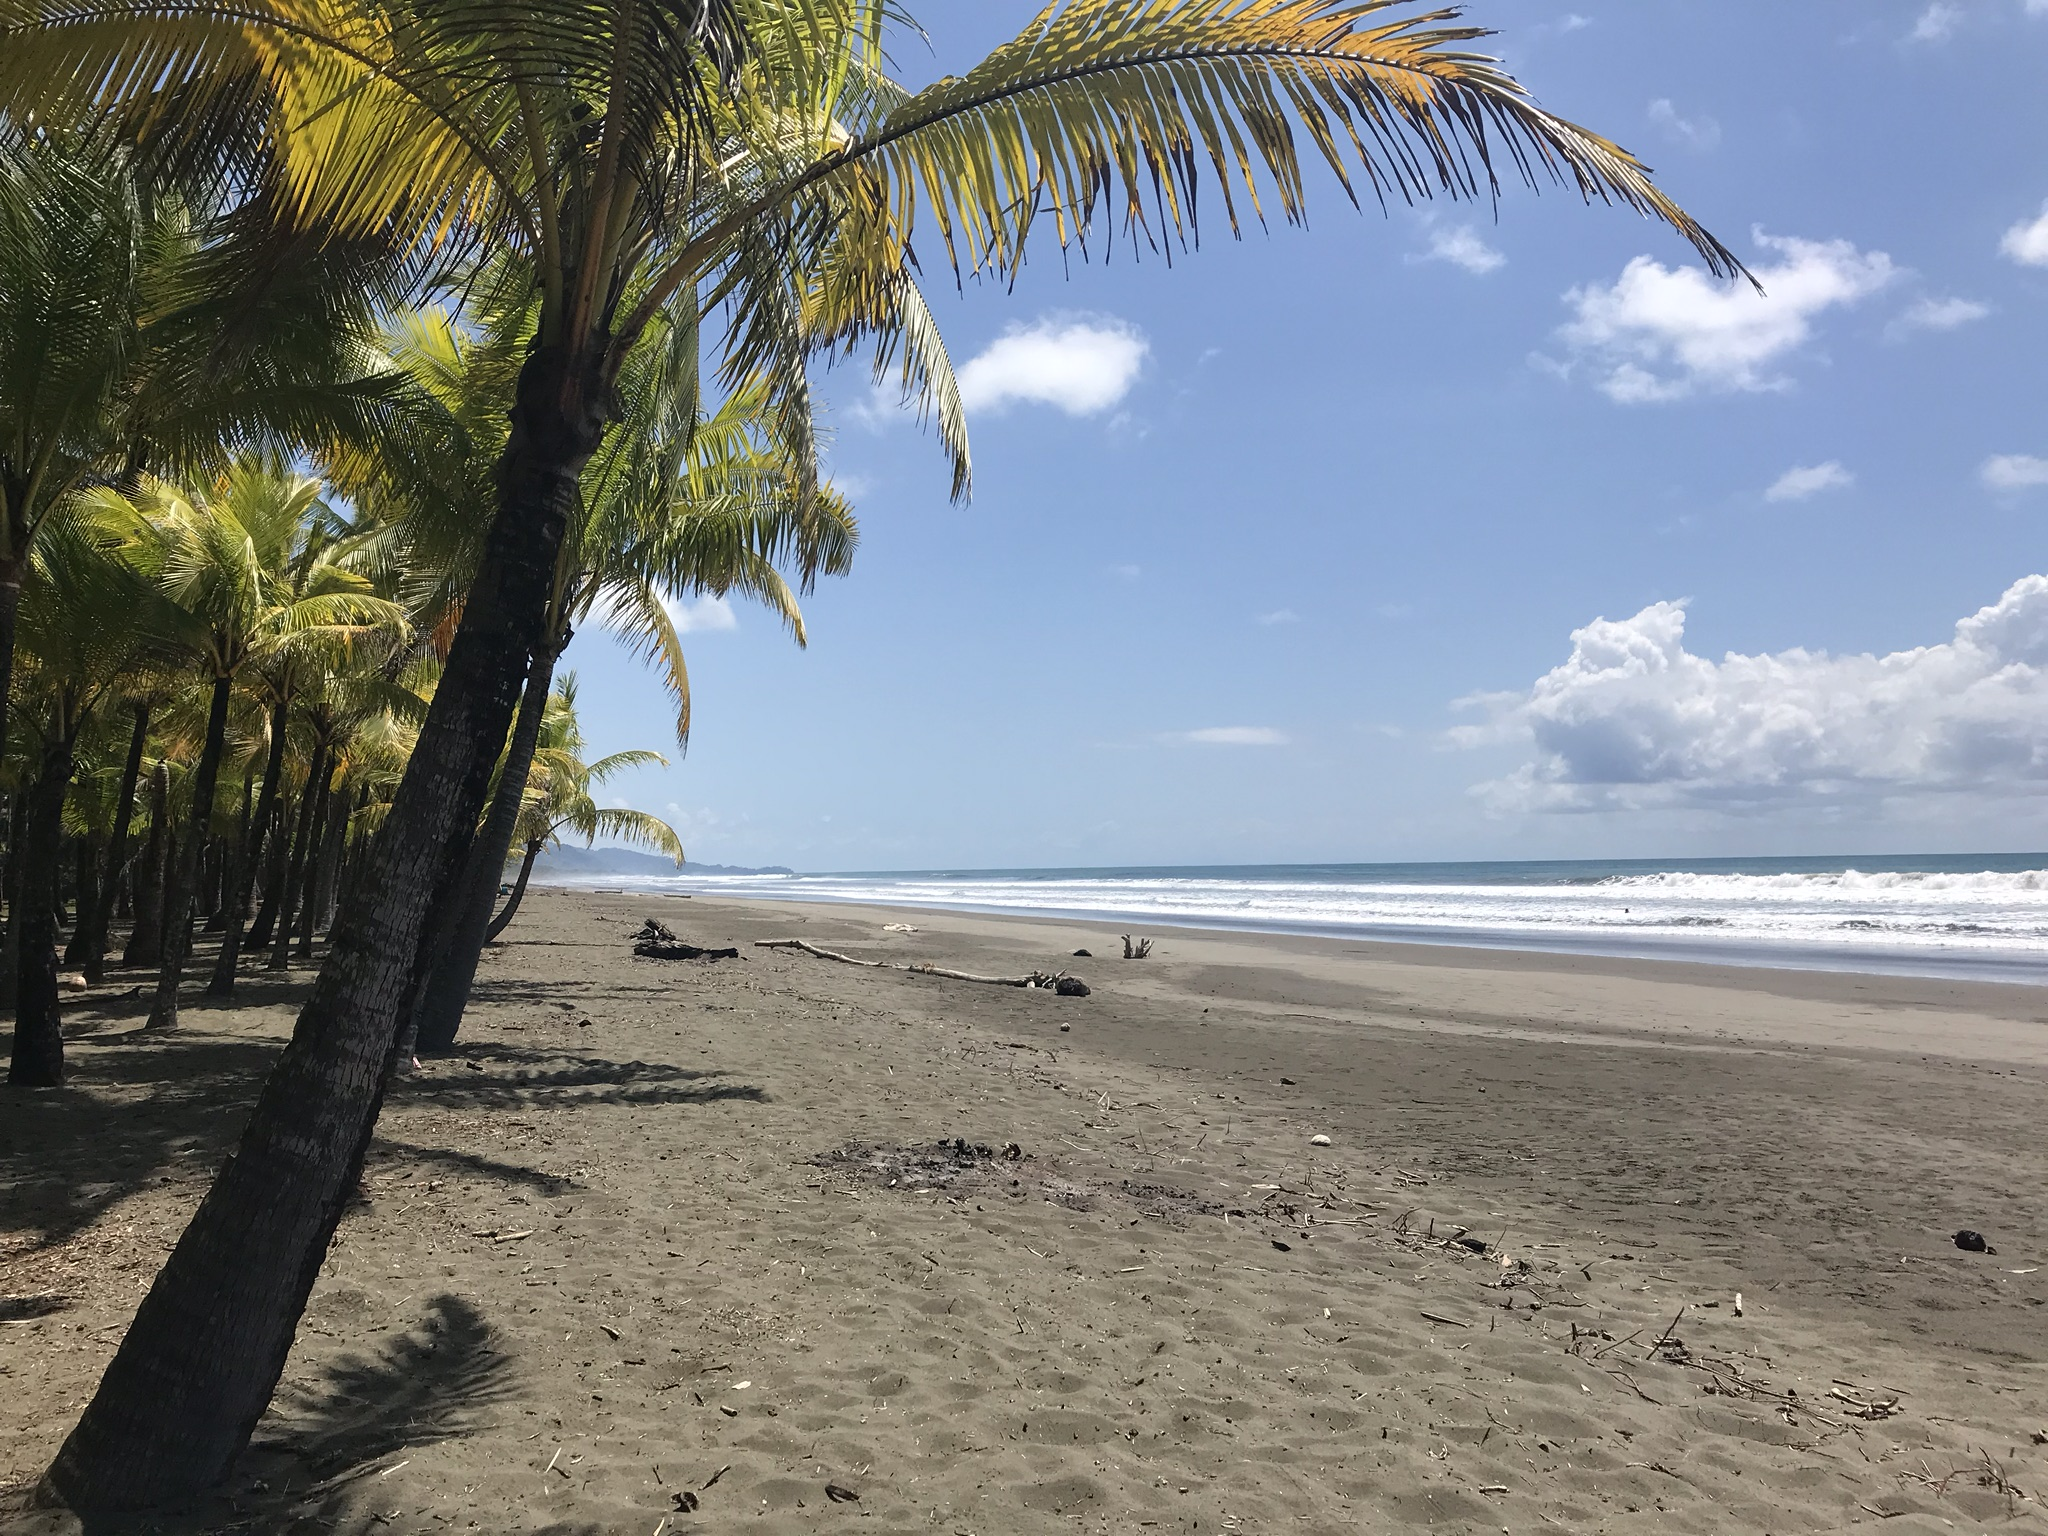 Beaches of the South - Casa Big Sur